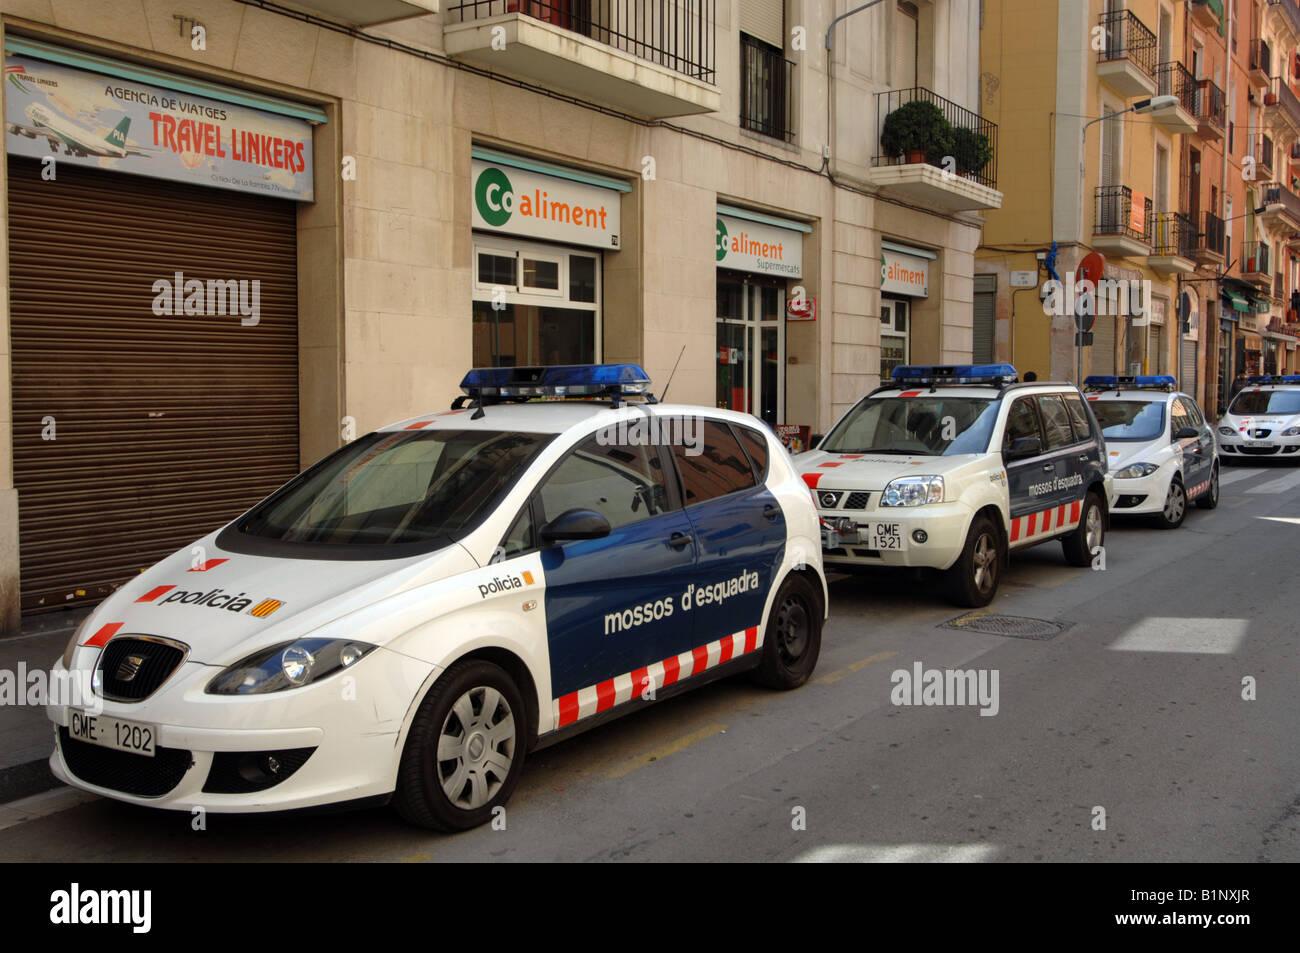 Spanish Police Cars Spain Stock Photo 18306927 Alamy